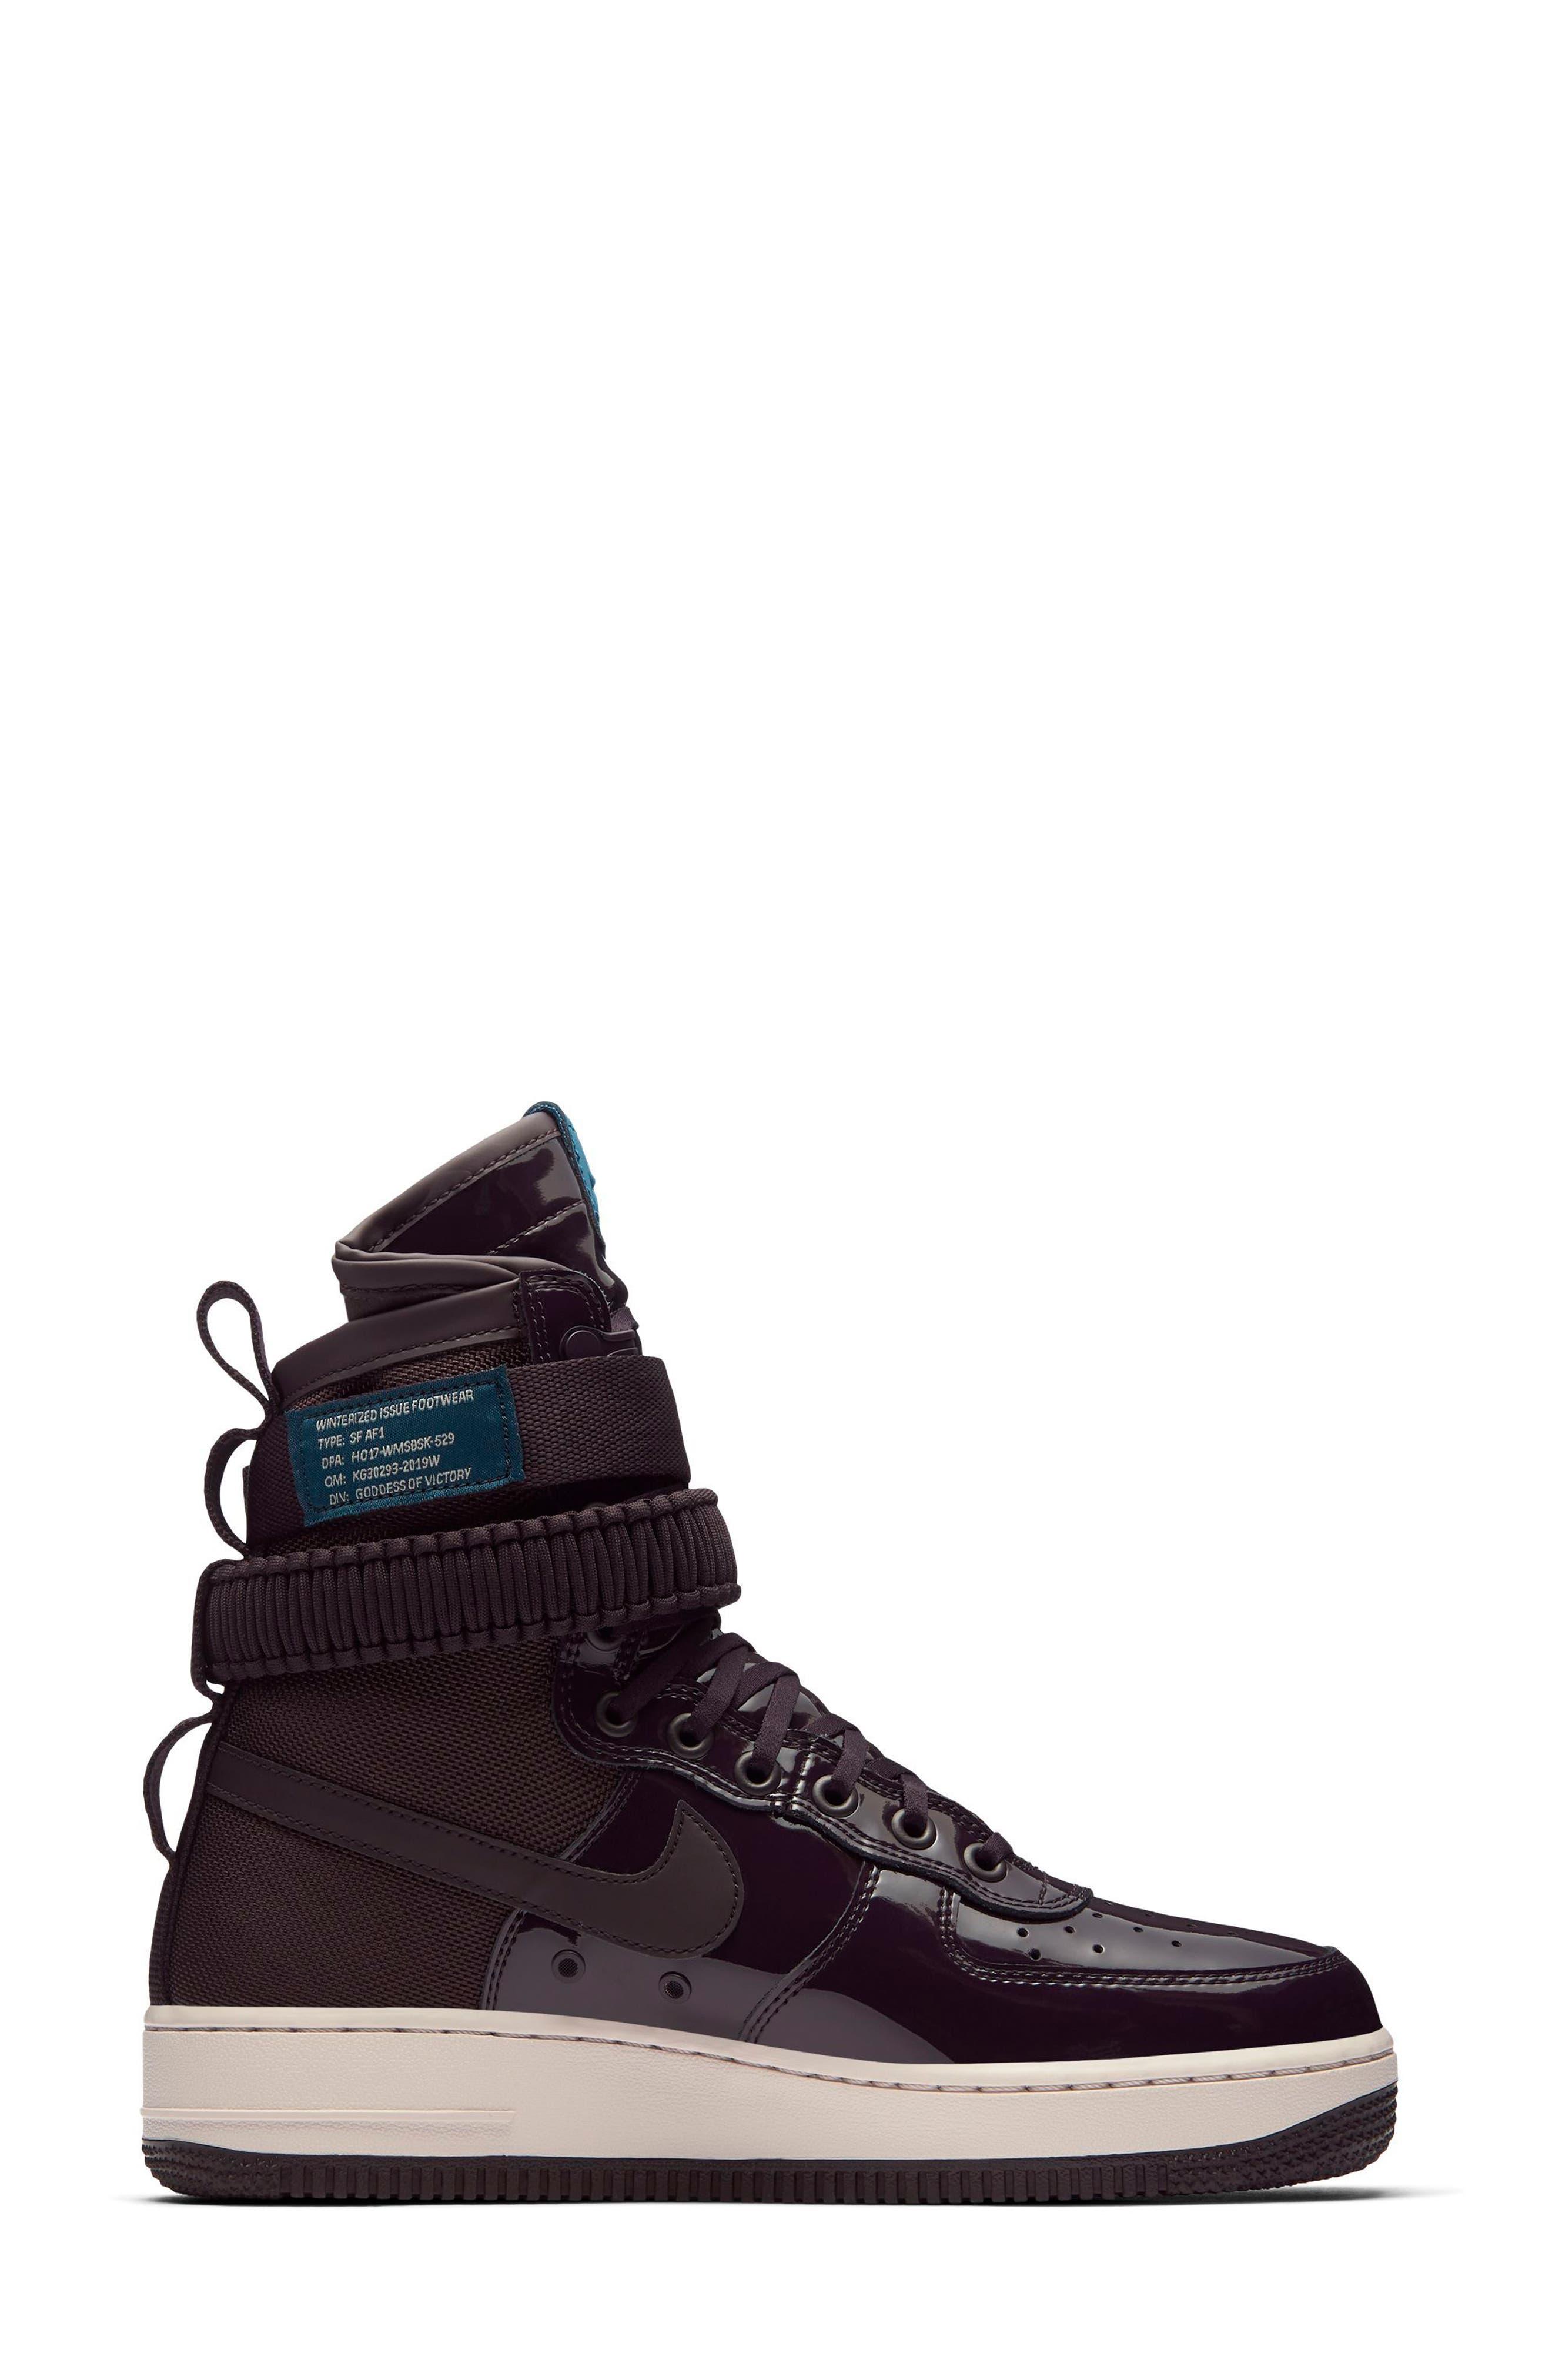 SF Air Force 1 High Top Sneaker,                             Alternate thumbnail 6, color,